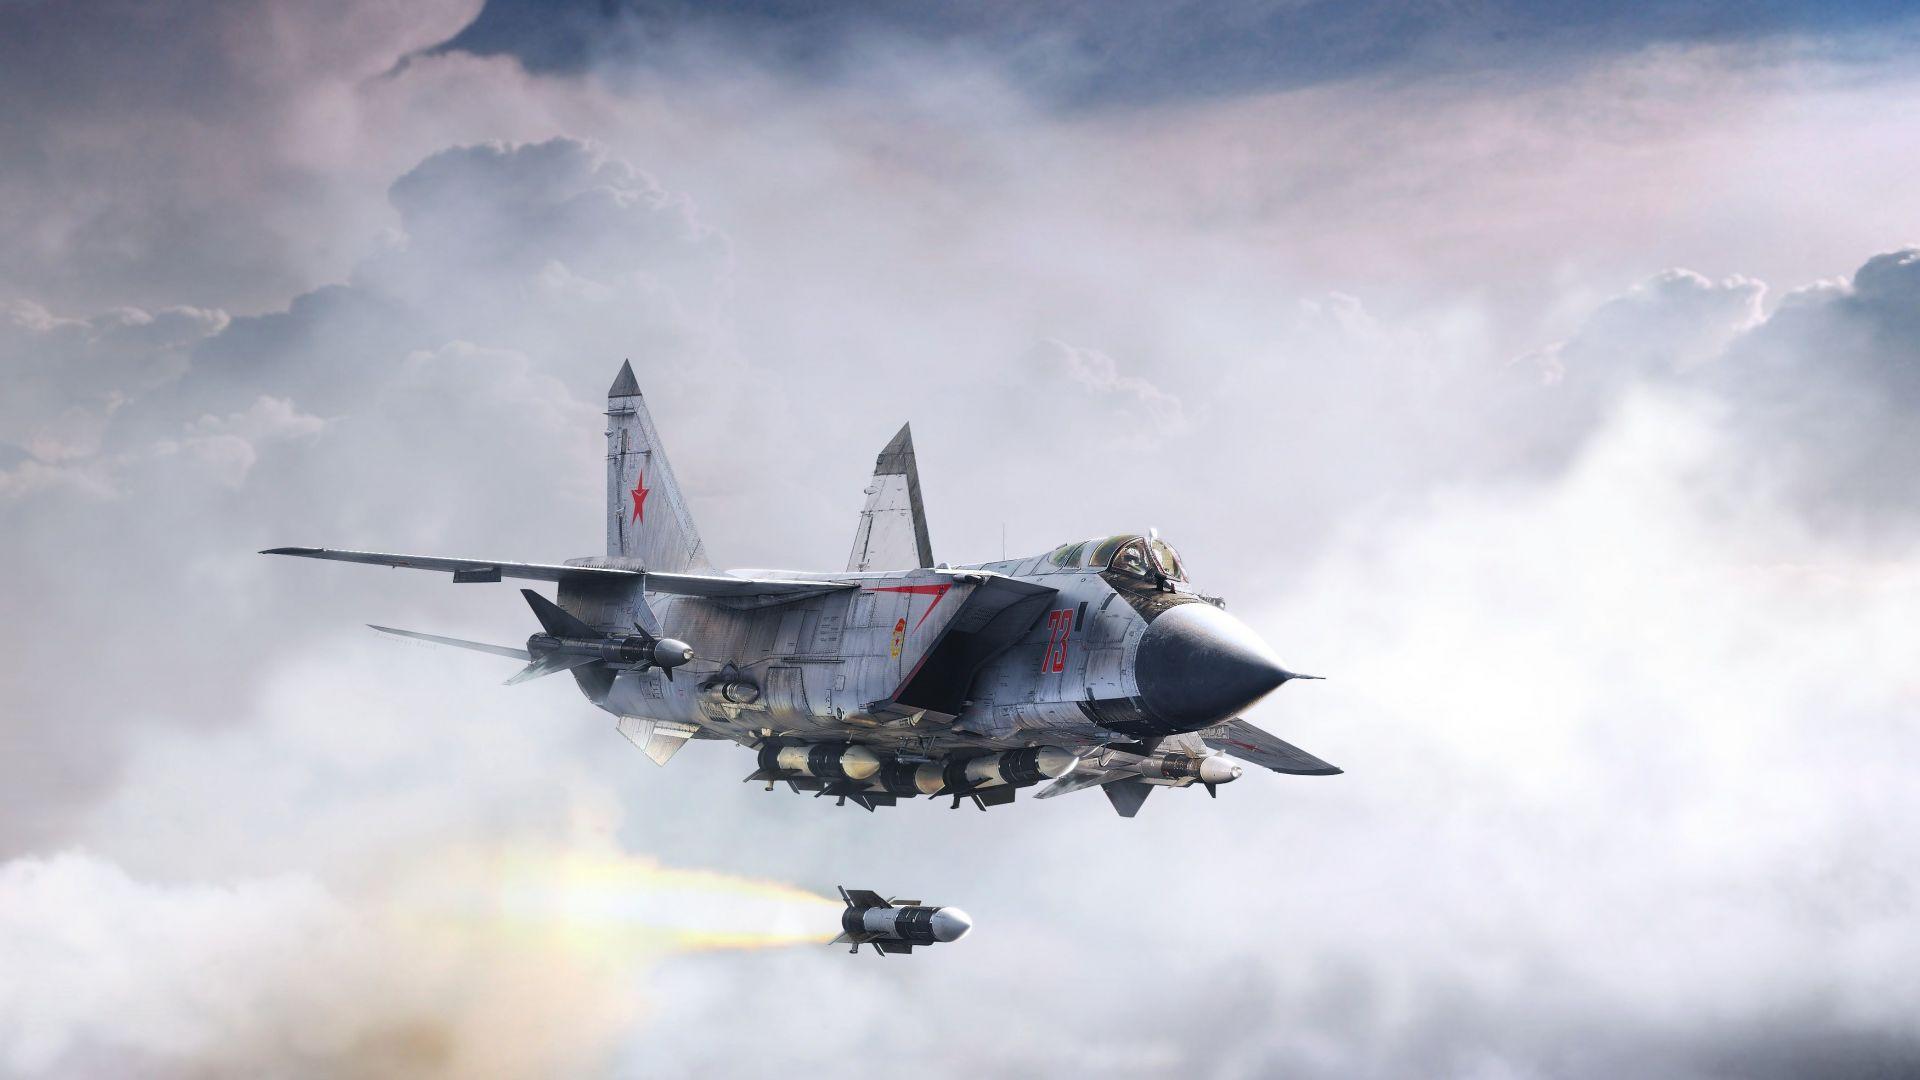 МиГ разработва самолет от пето поколение